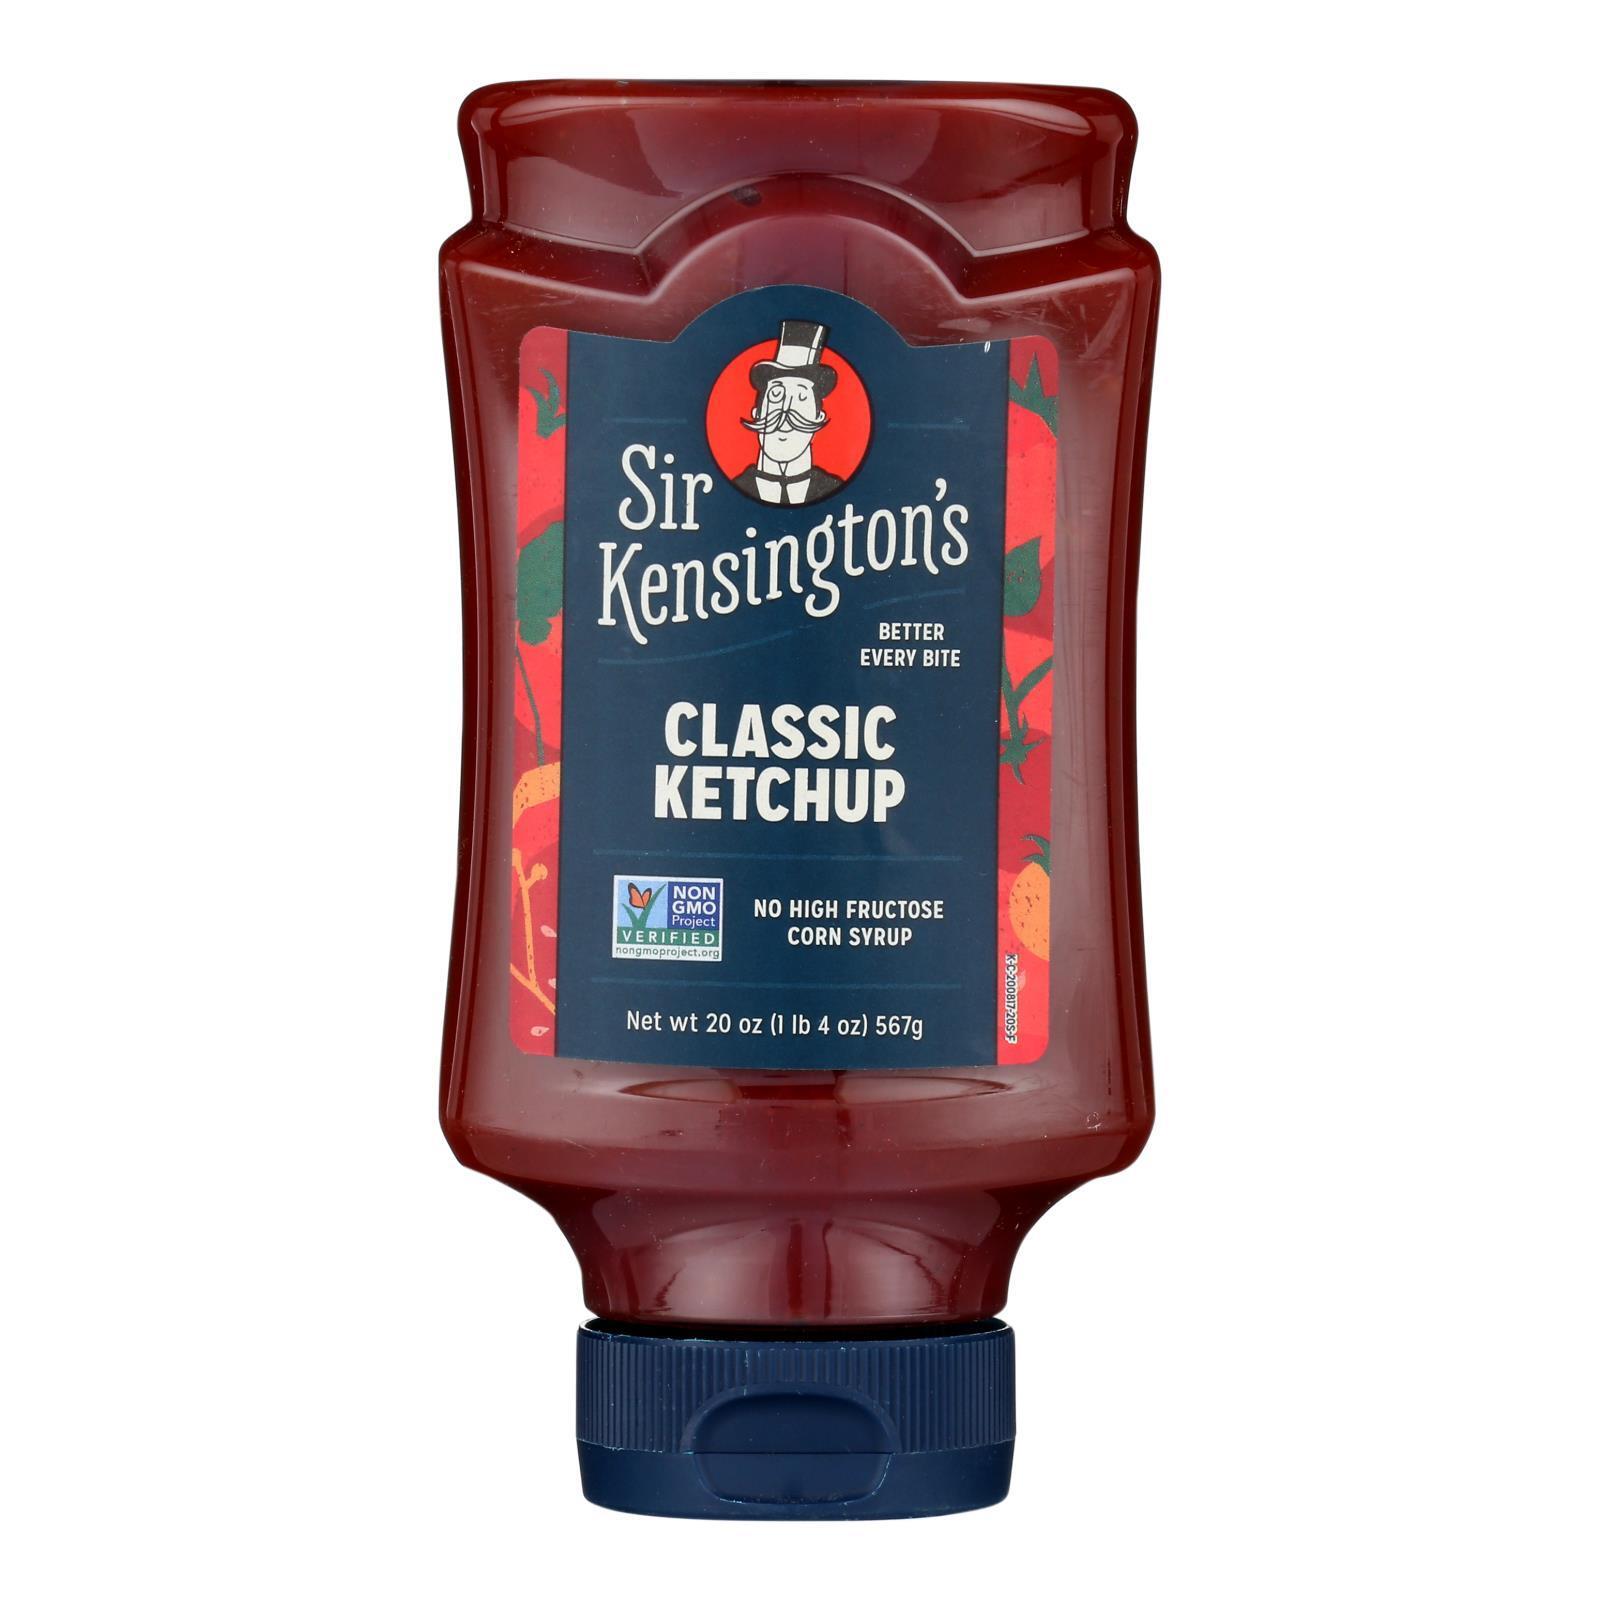 Sir Kensington's Ketchup - Squeeze Bottle - Case of 6 - 20 oz